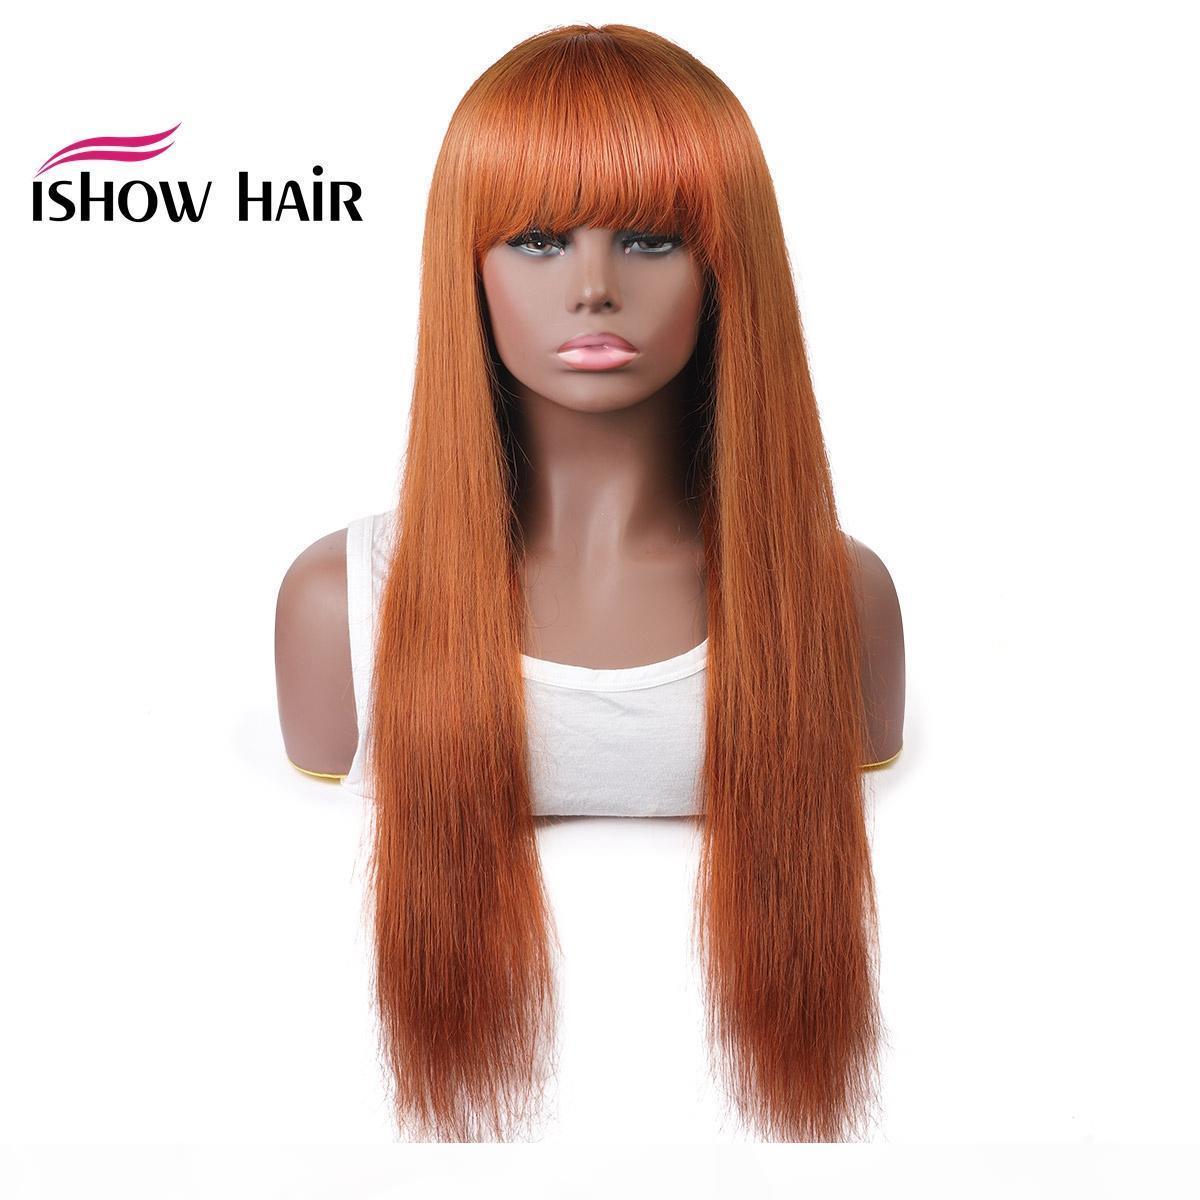 Ishow Saç Brezilyalı 4 27 Düz İnsan Saç Peruk Bangs 27 # 30 # 99J Turuncu Ginger Perulu Yok Dantel Peruk Hint Saç Malezya